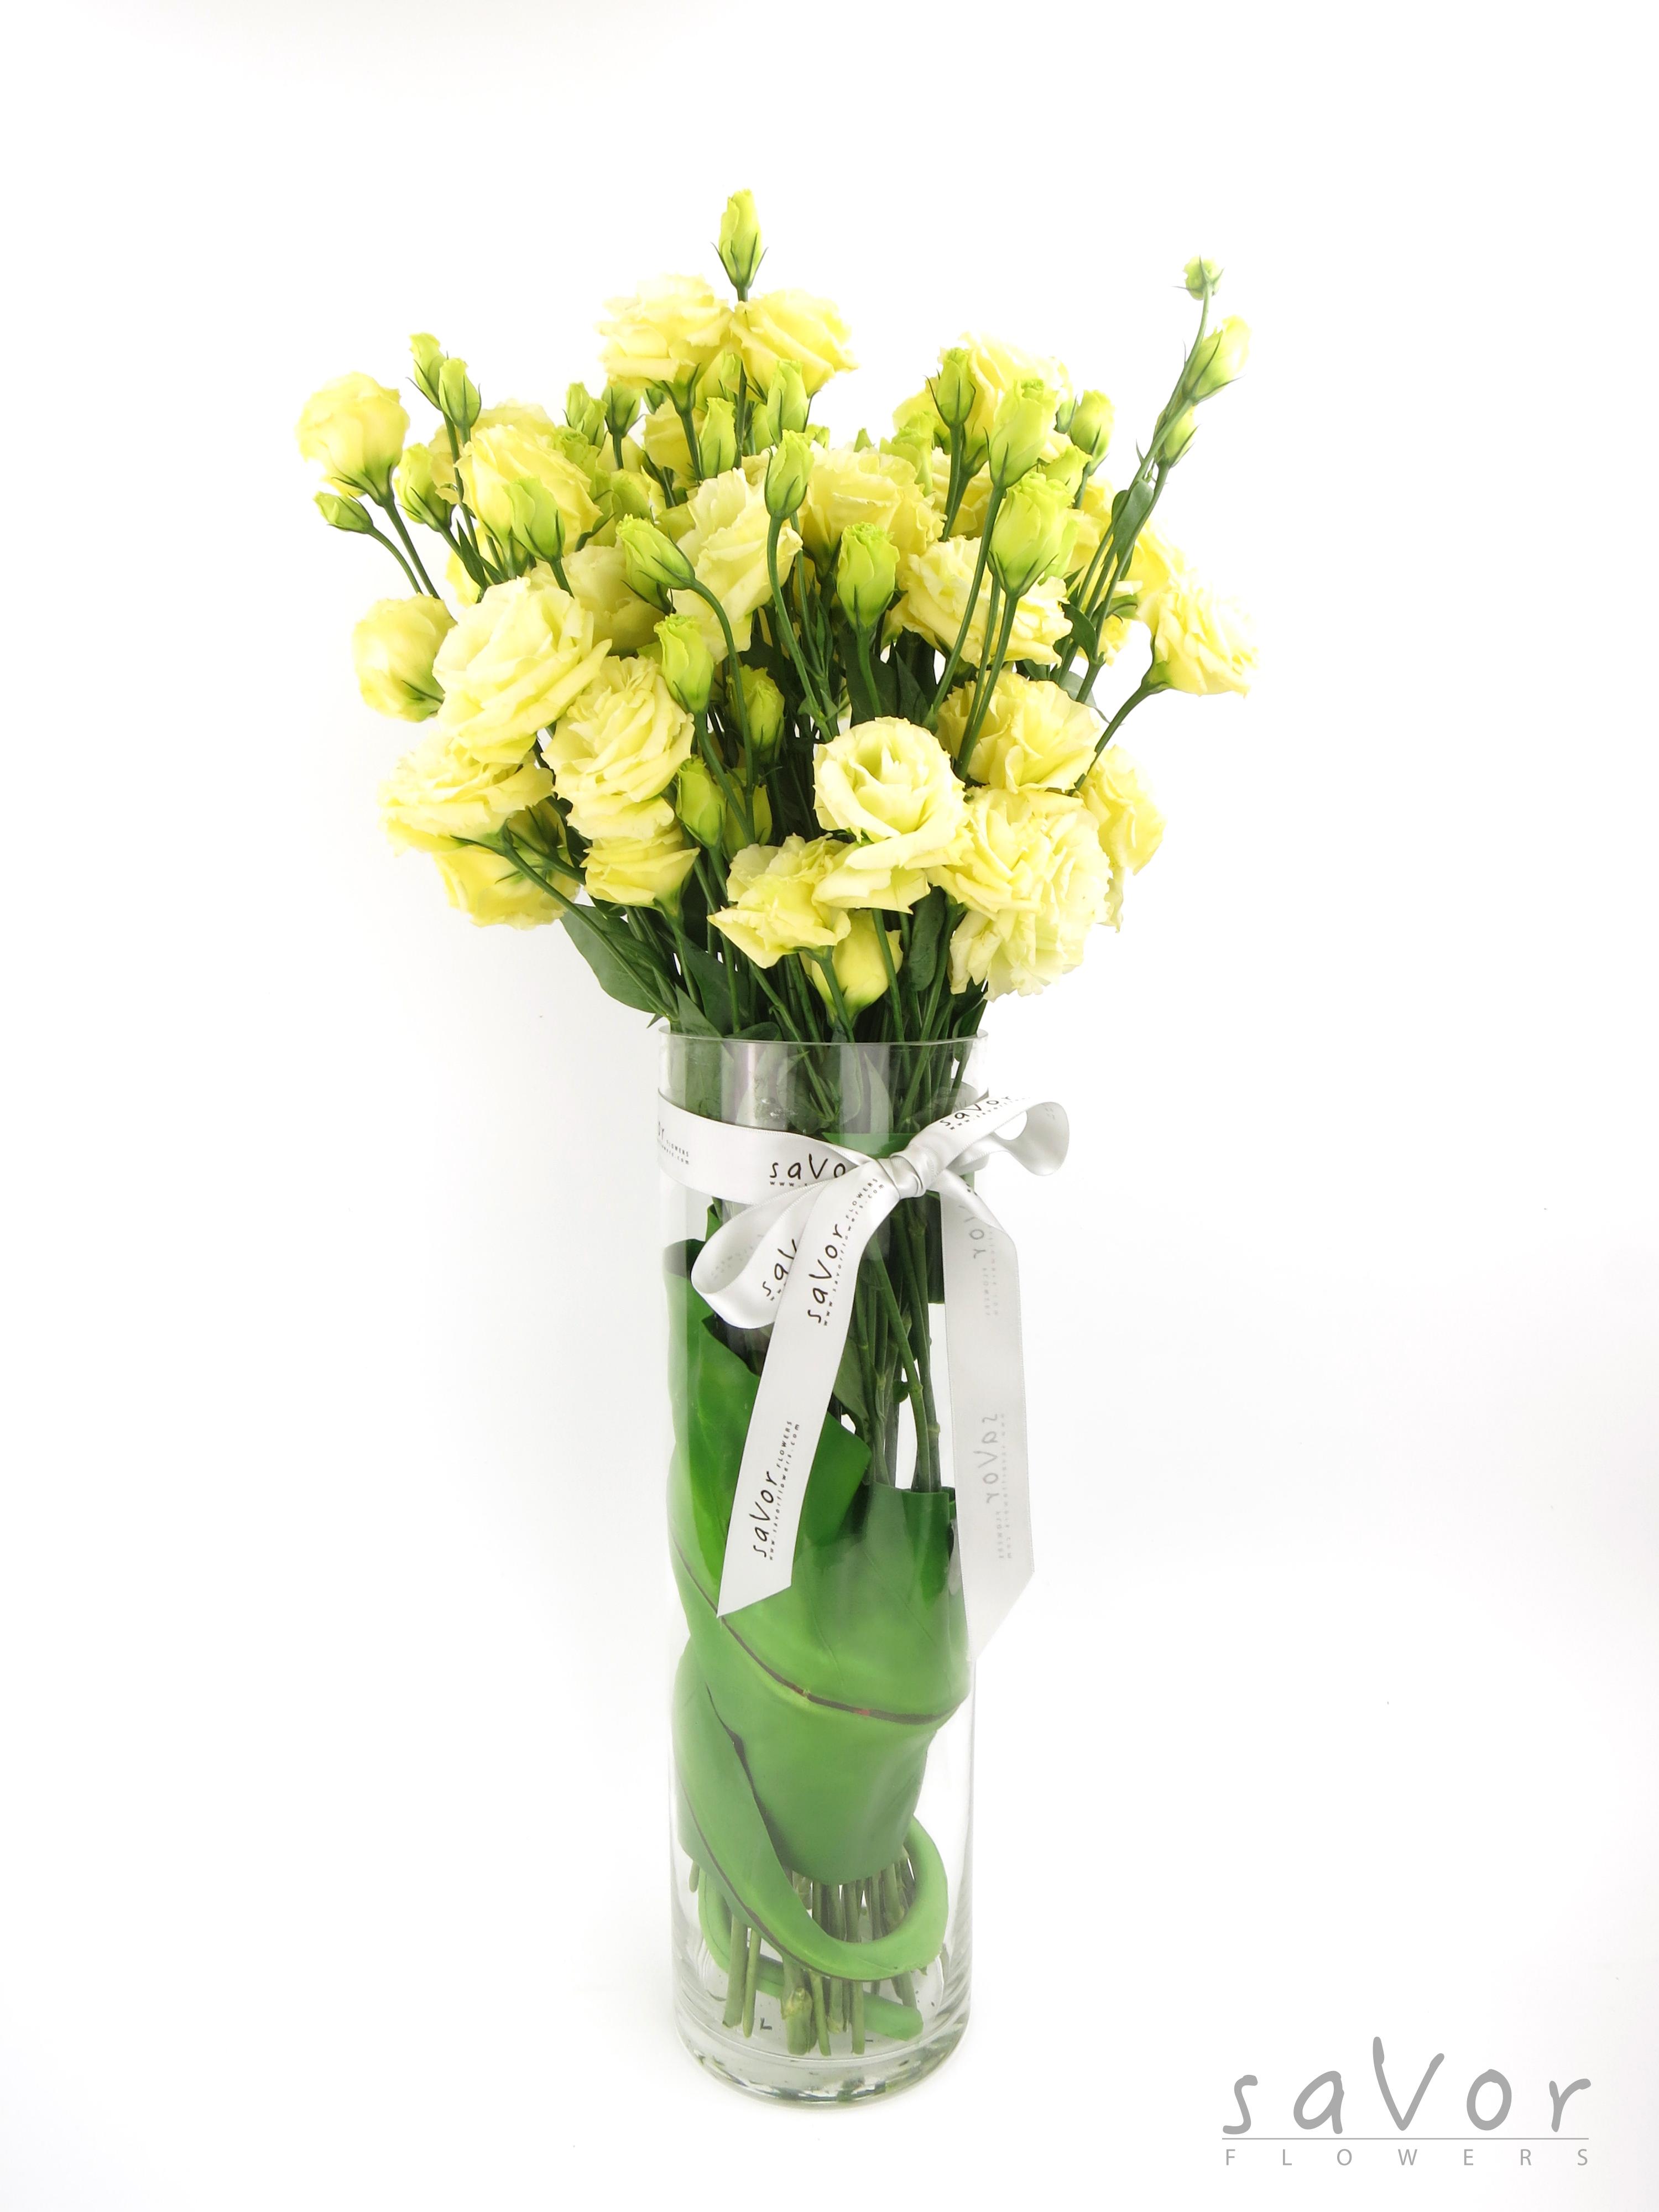 Flowers in vase savor flowers flowers in vase reviewsmspy